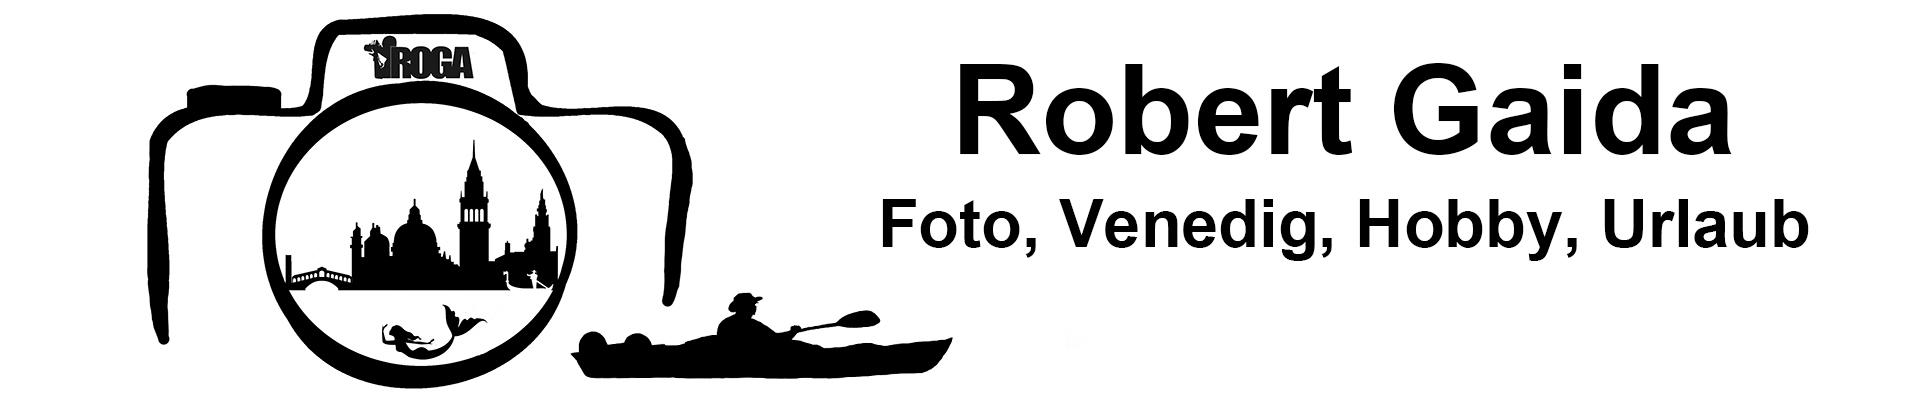 Foto Venedig Hobby Urlaub Kajak